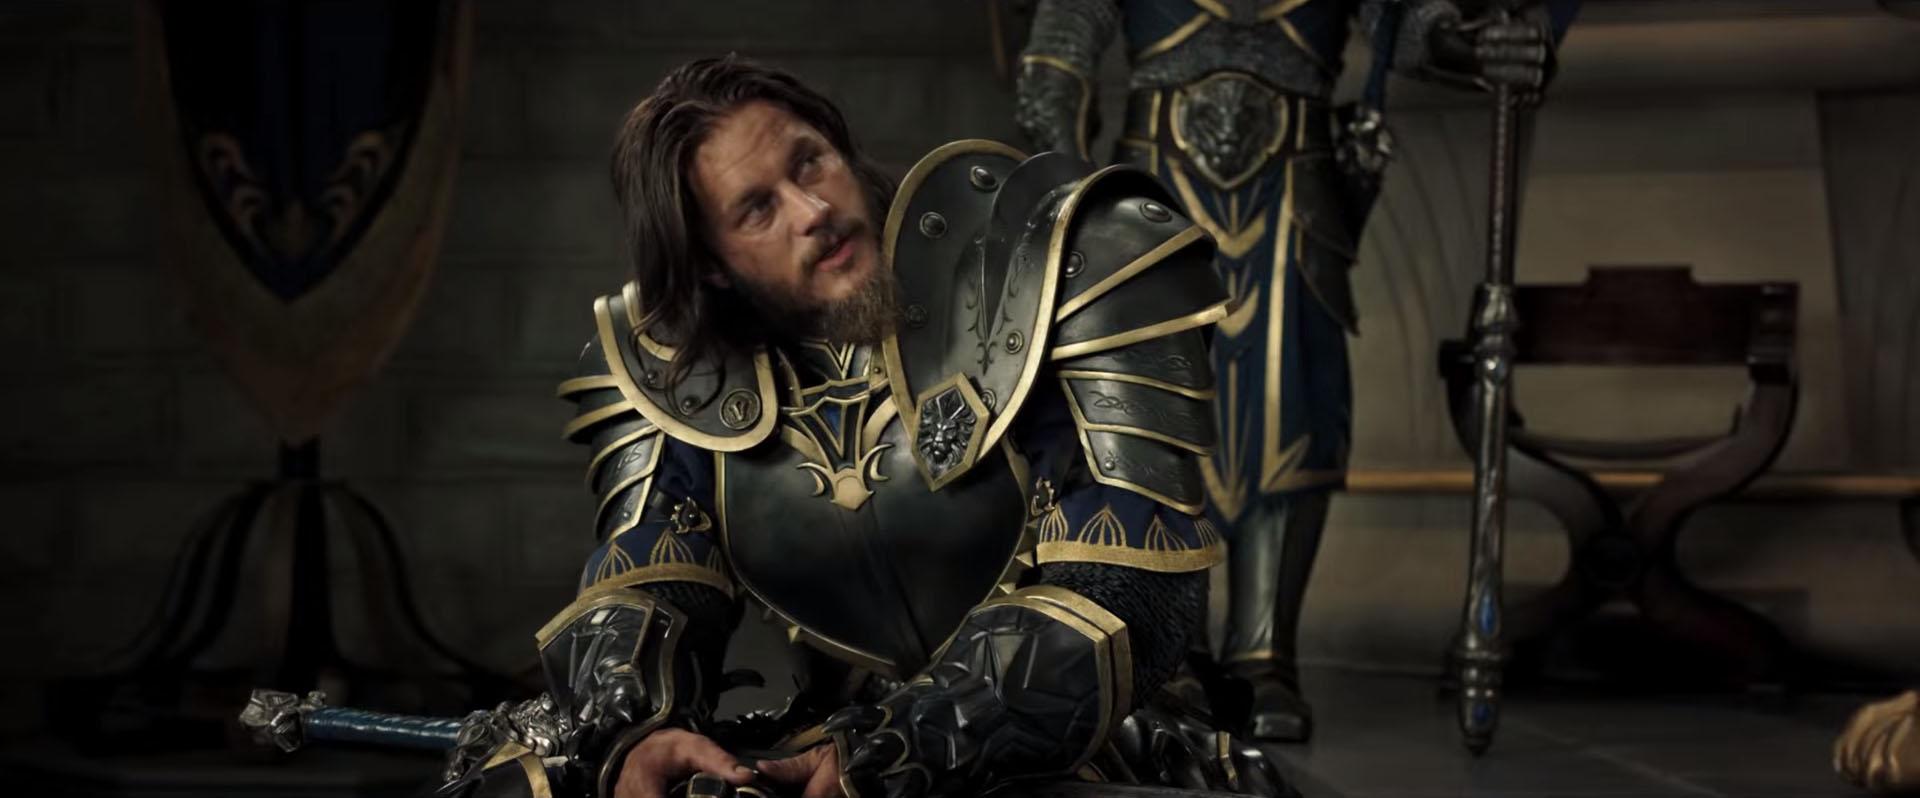 Warcraft Fragmanı 37